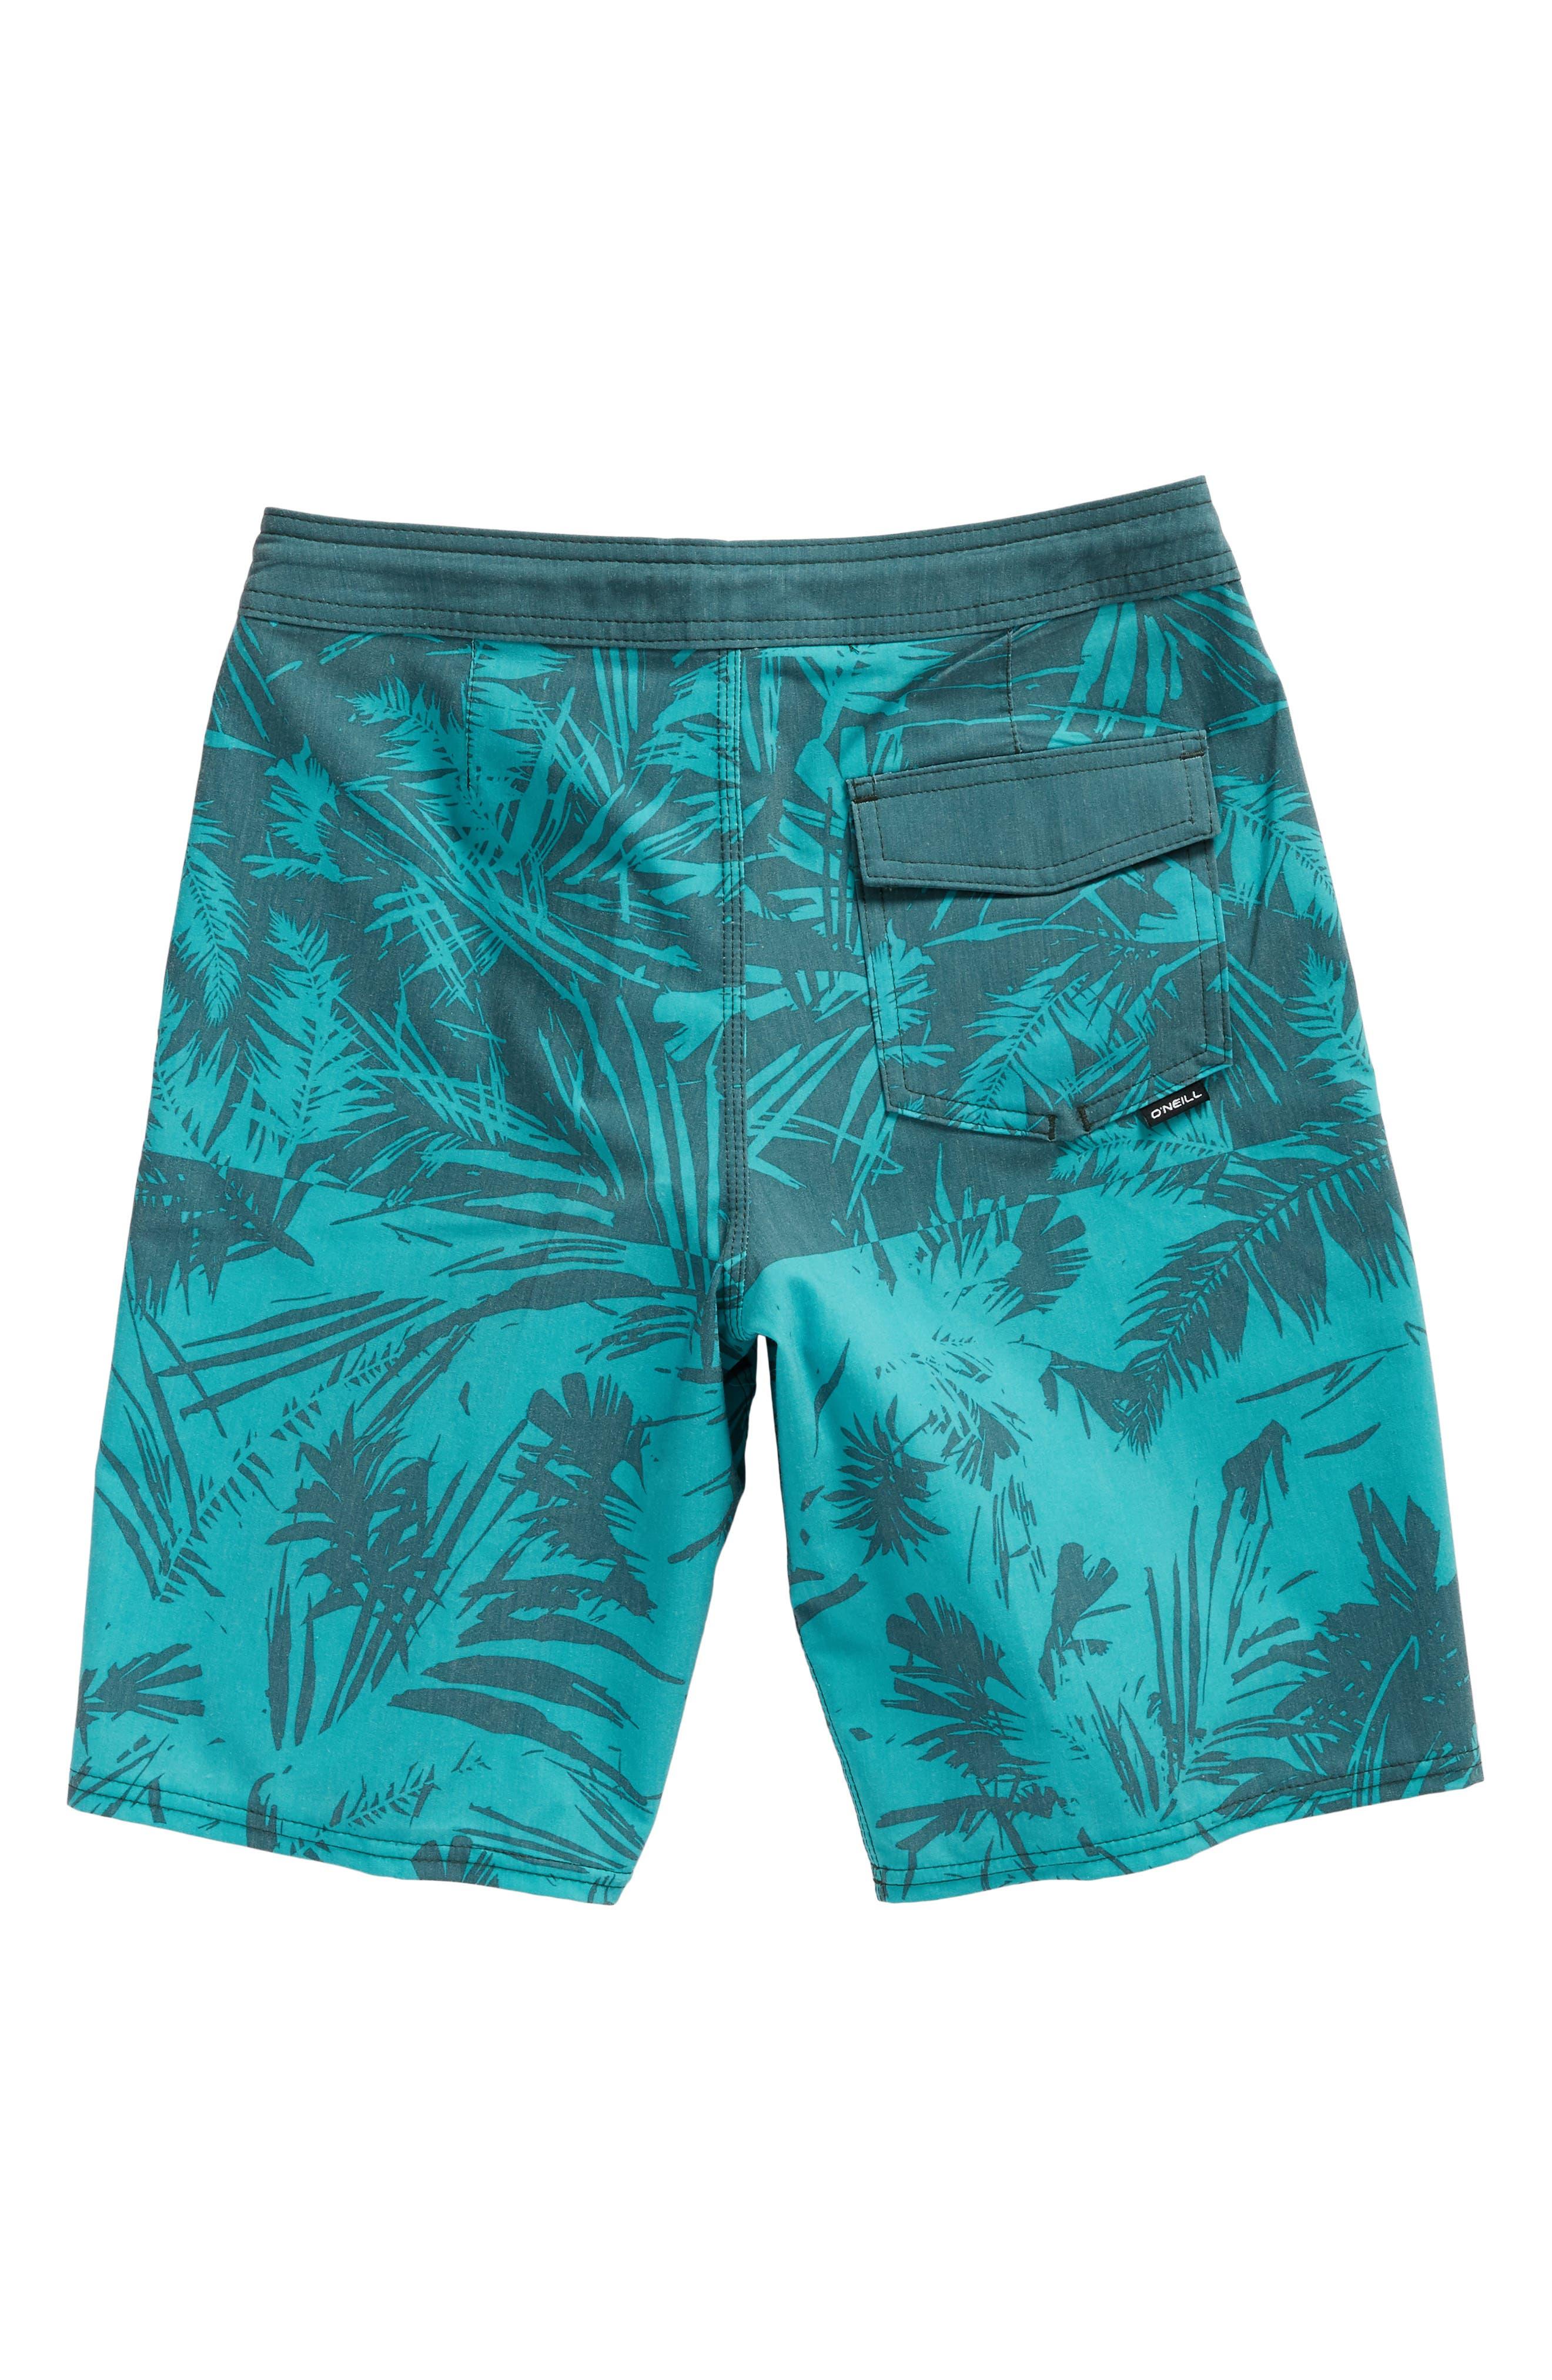 Inverted Cruzer Board Shorts,                             Alternate thumbnail 4, color,                             Aqua